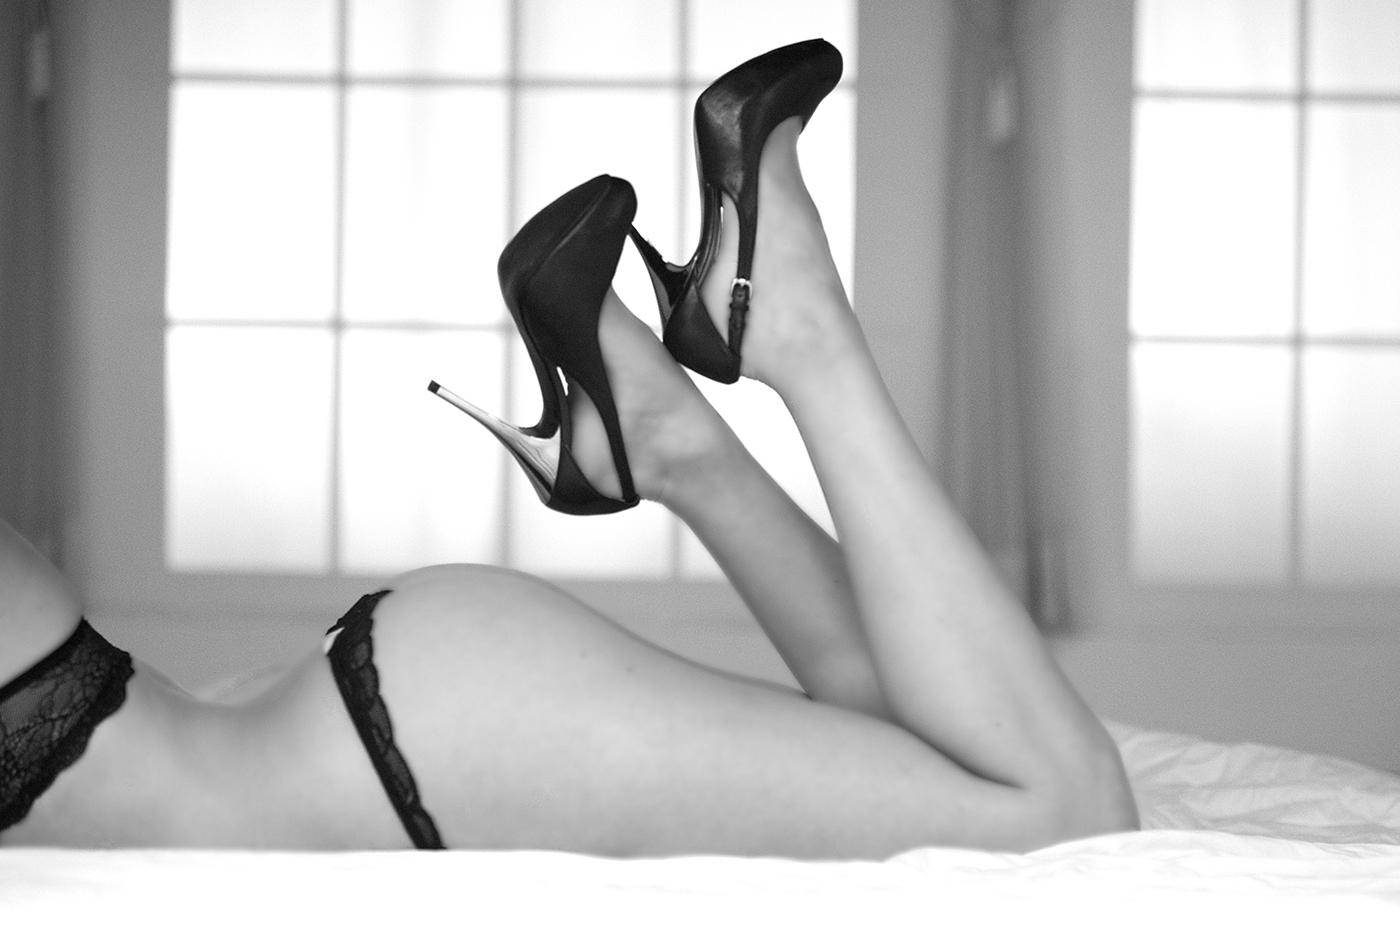 #yeg #boudoir #boudior #photography #photographer #photo #picture #boudoirpicture